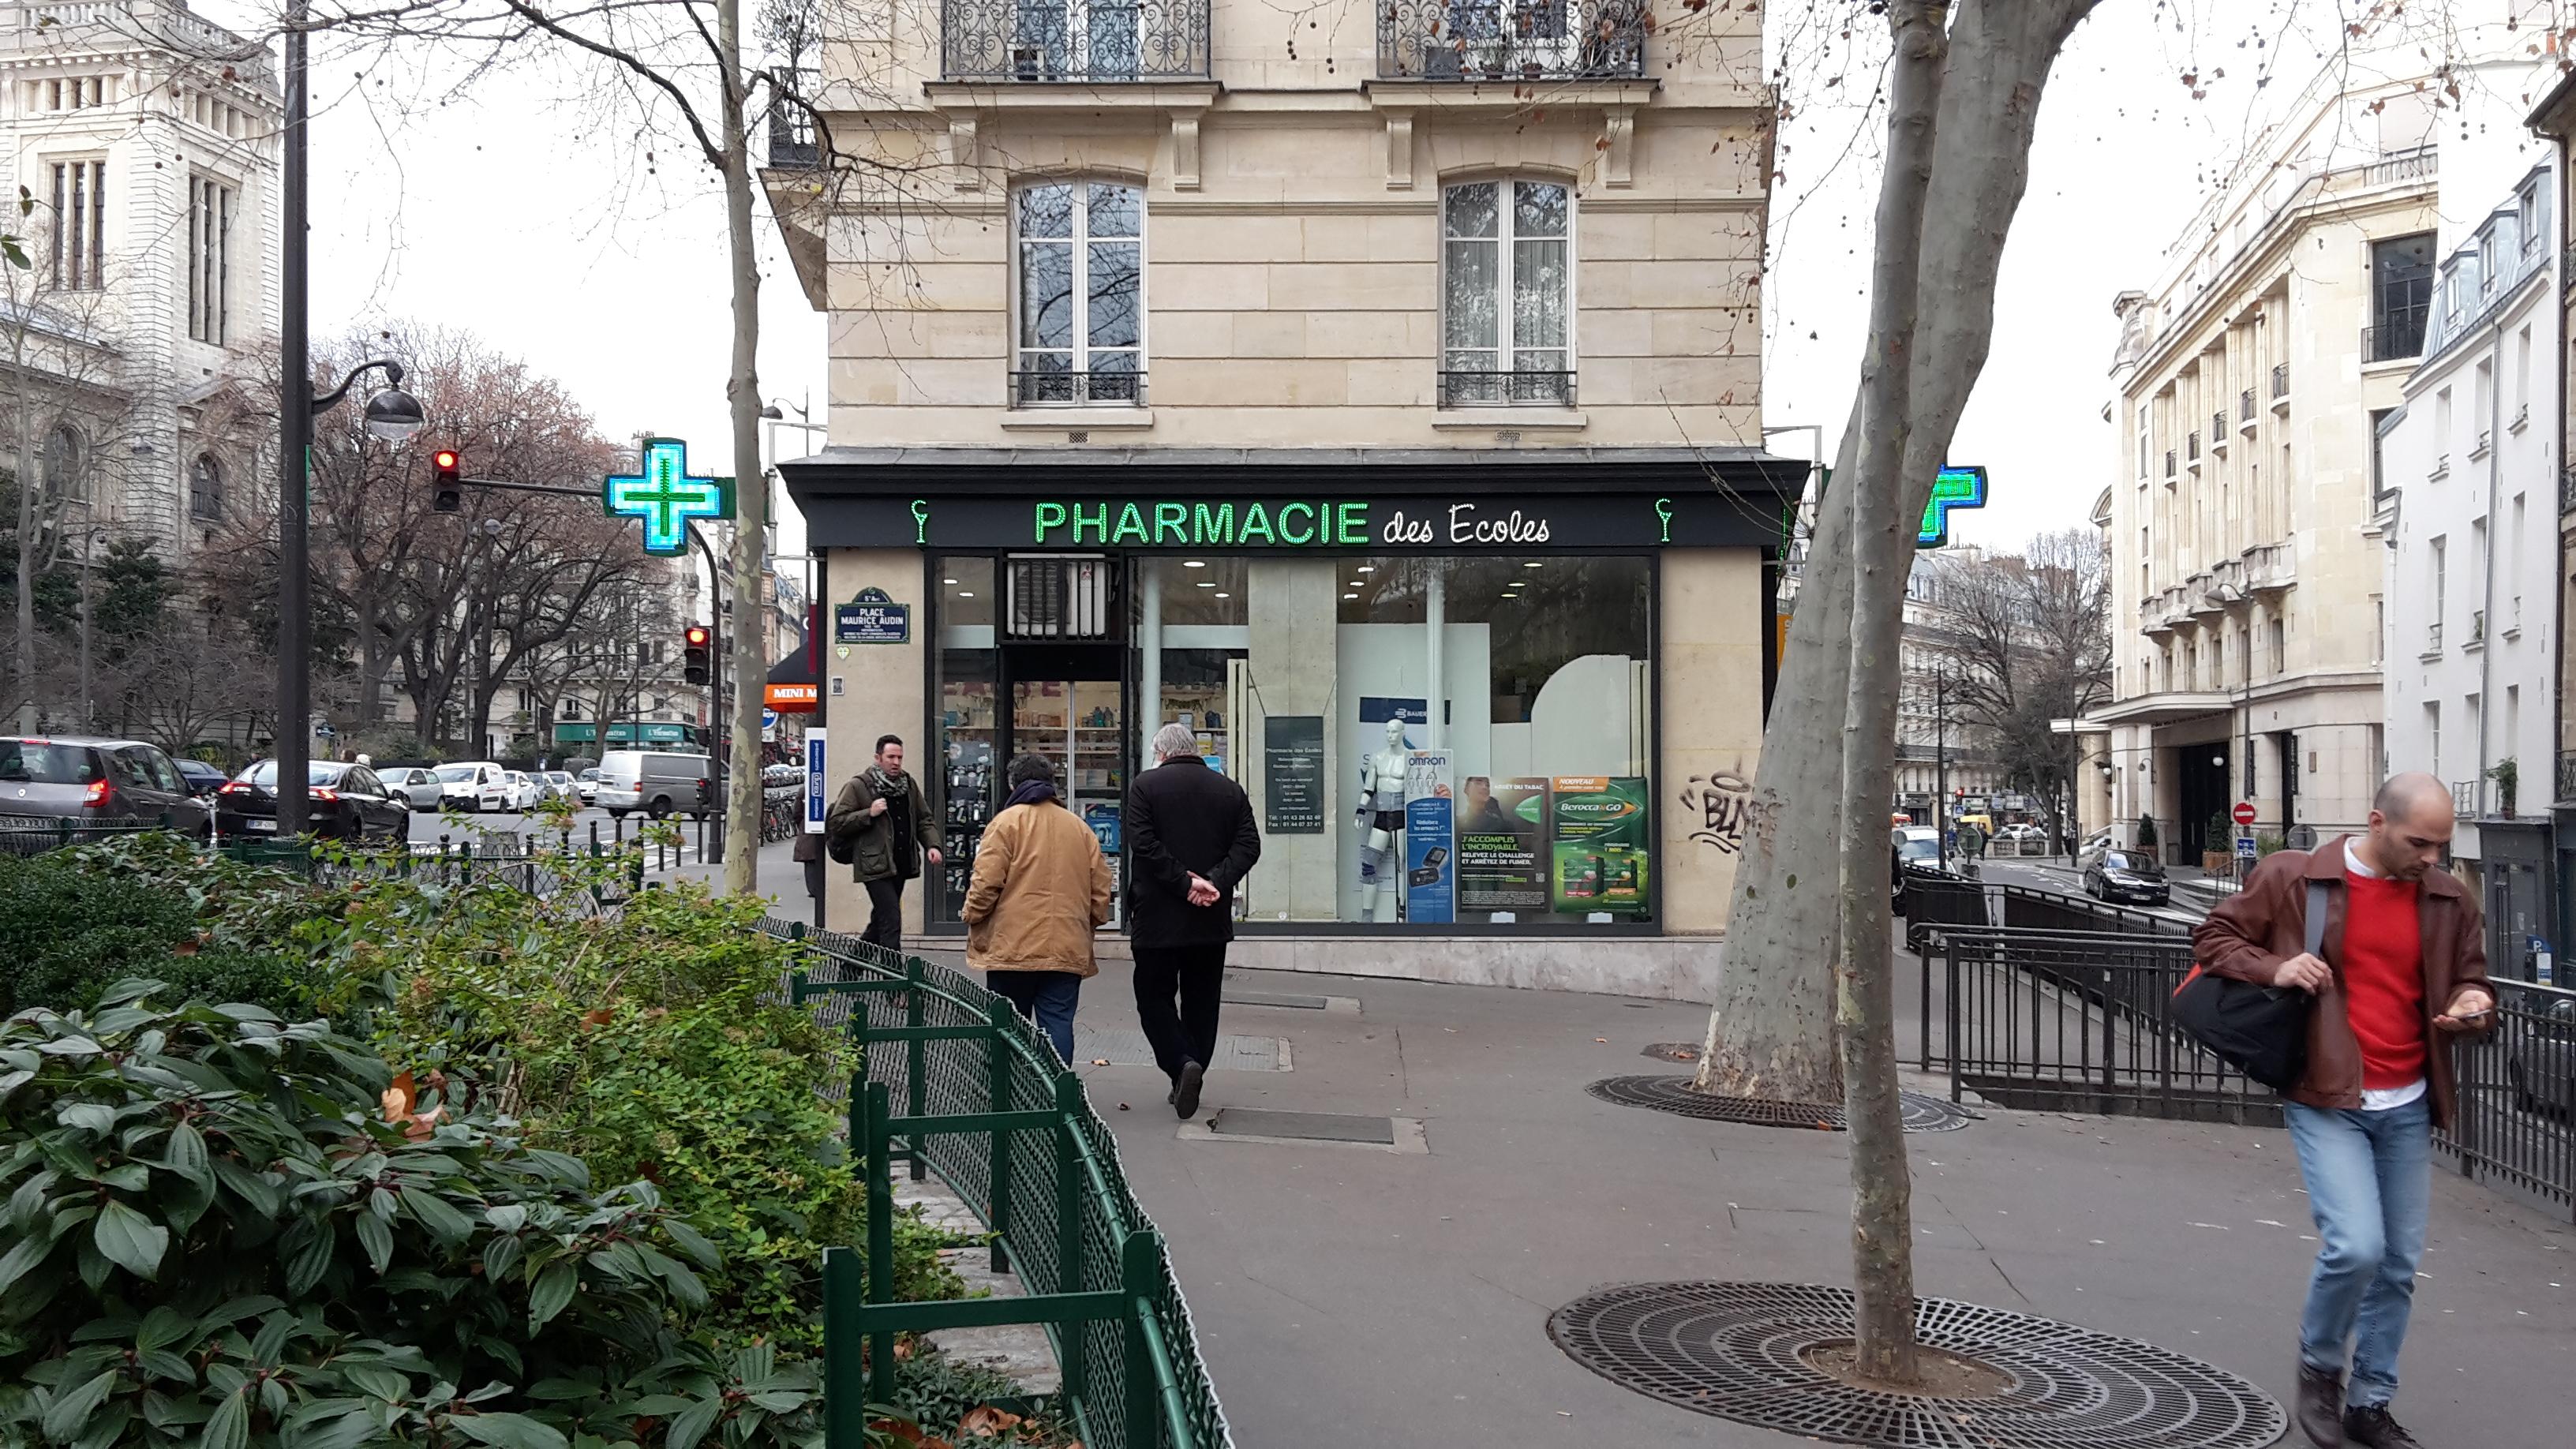 Pharmacie des coles paris en m tro - Metro gare de lyon porte de versailles ...